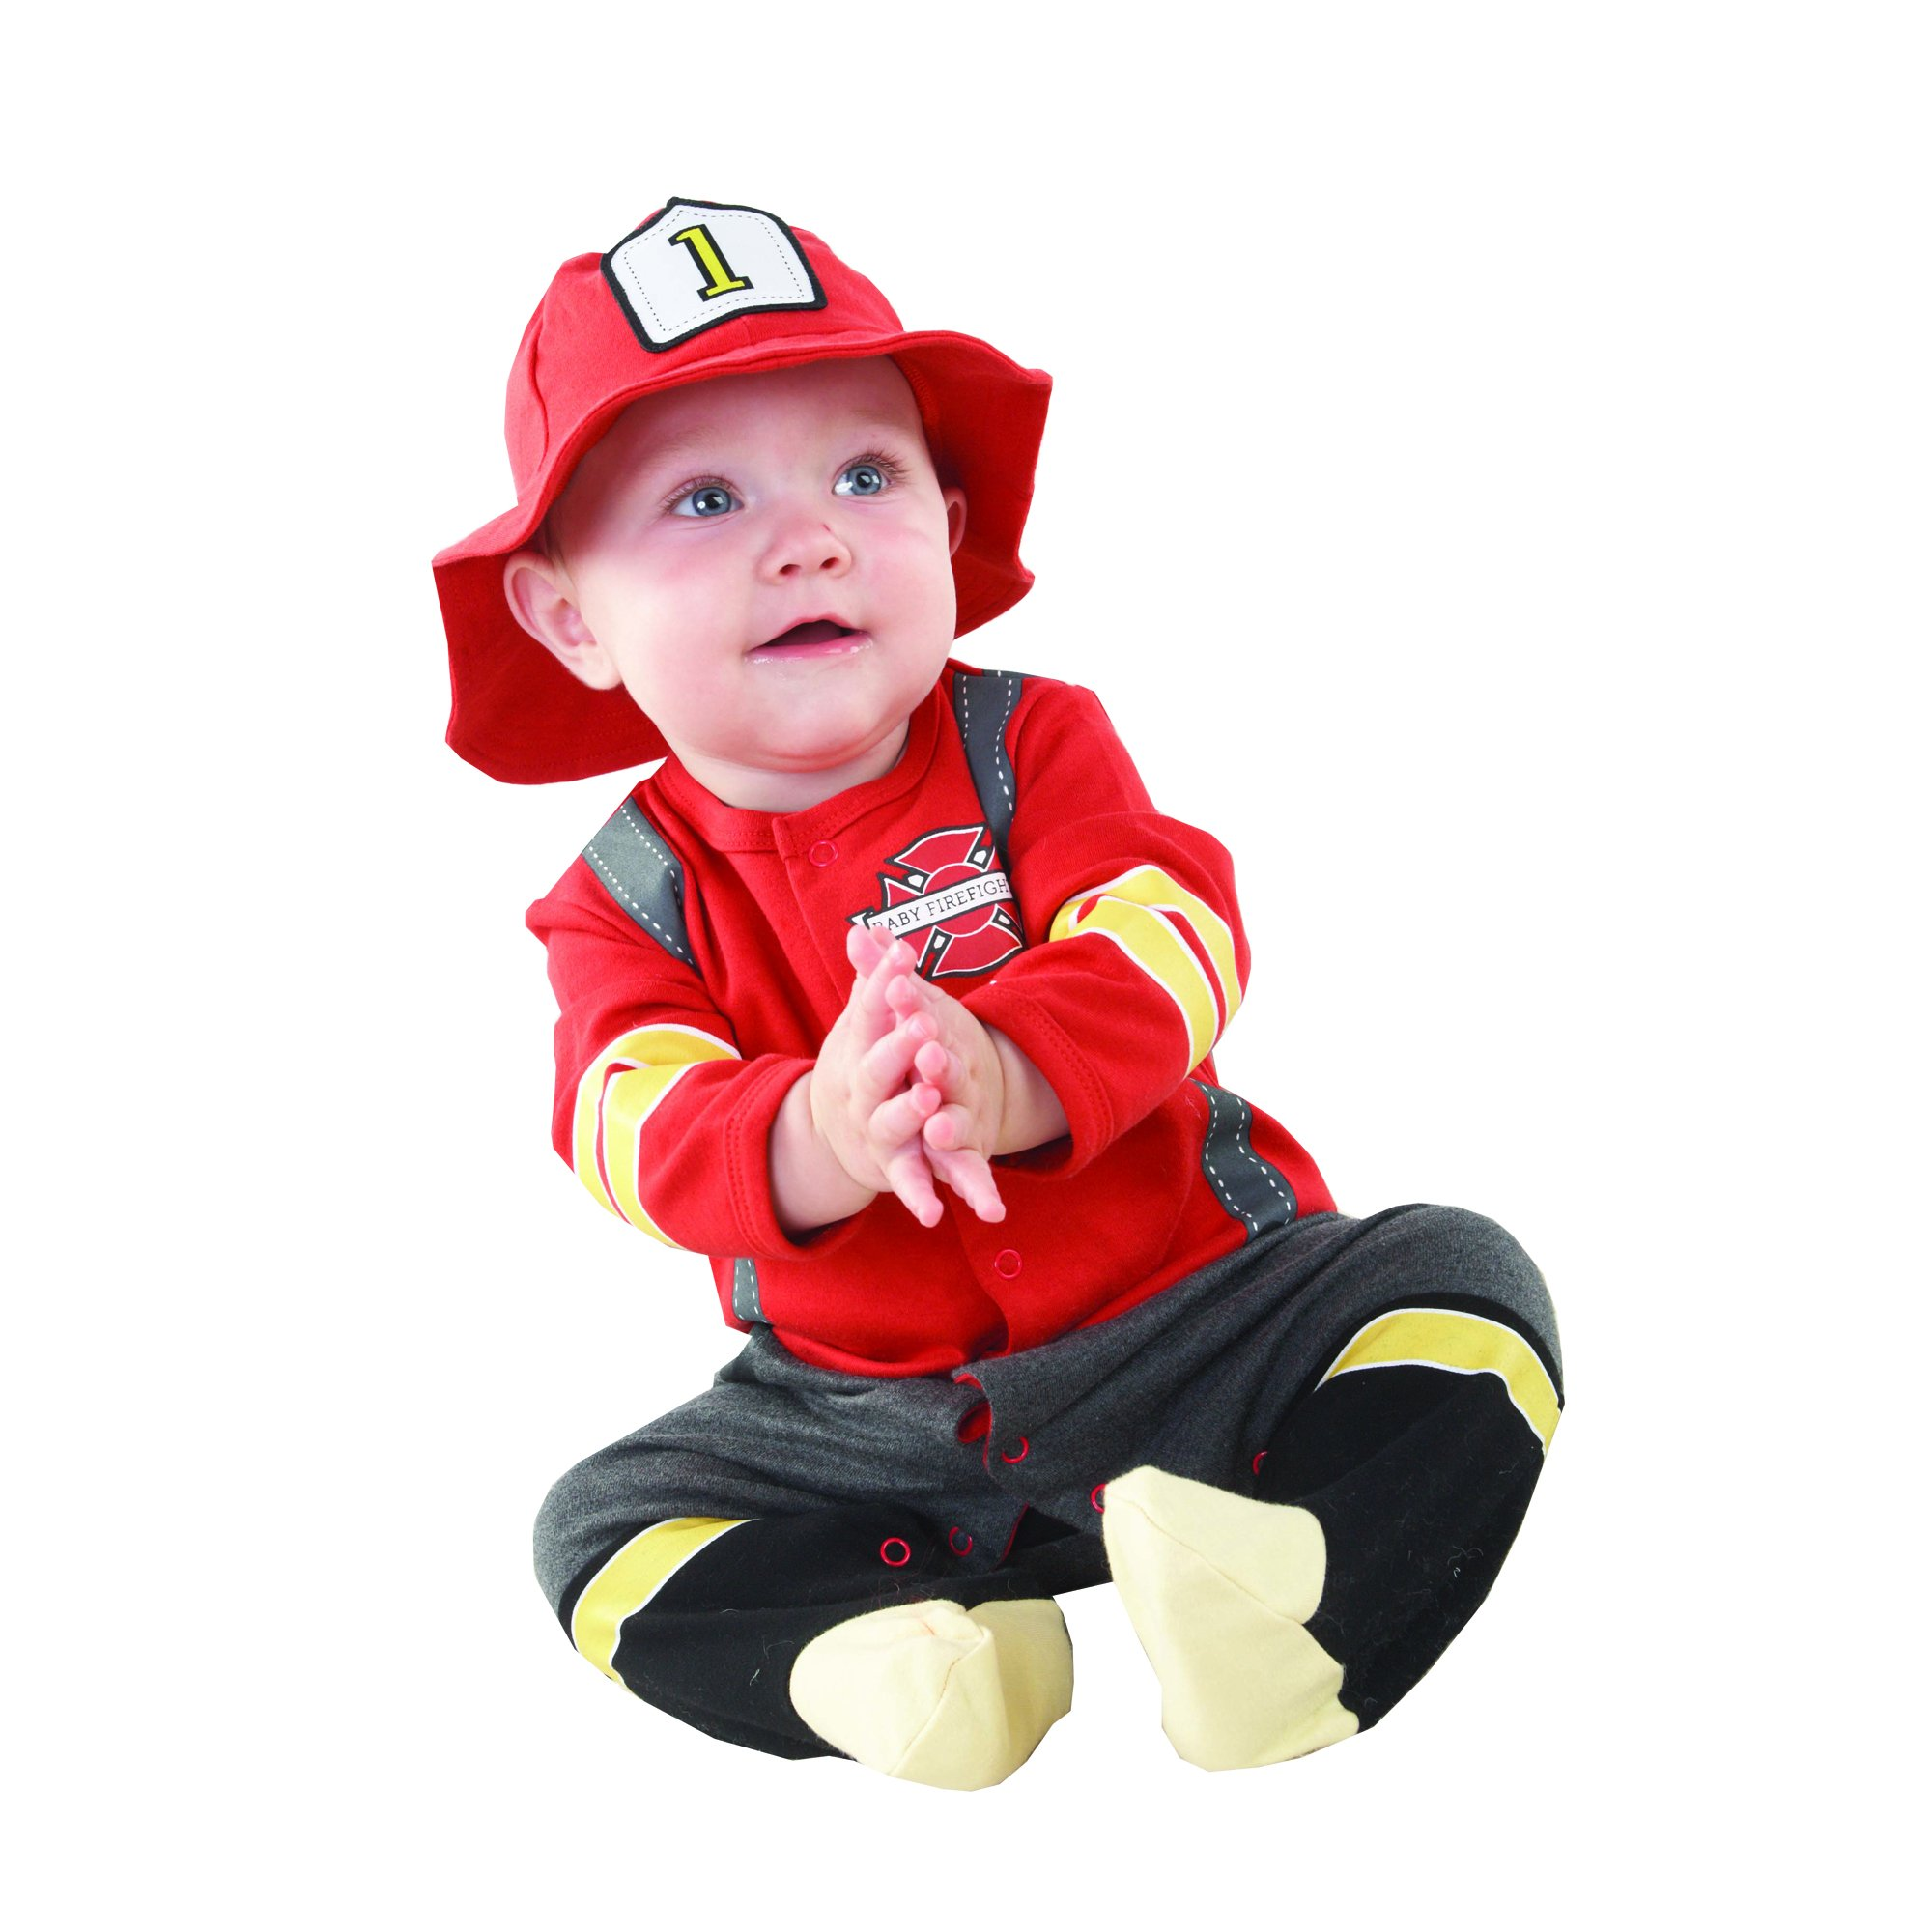 Baby Aspen Baby Firefighter Themed Gift Box Baby Firefighter Newborn Halloween Costume  sc 1 st  Amazon.com & Amazon.com: Baby Aspen Baby M.D. Three-Piece Layette Set in ...